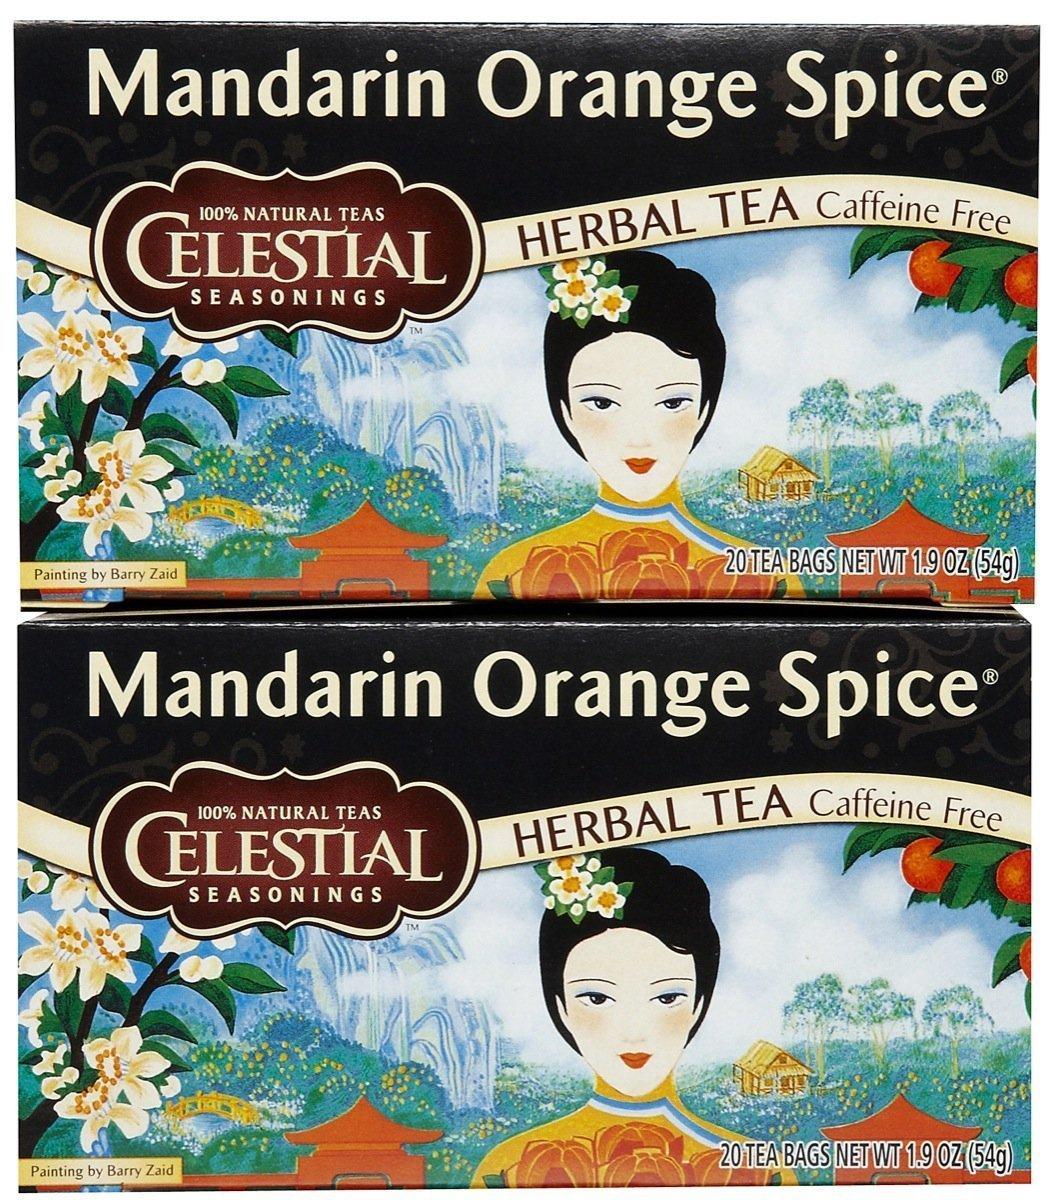 Celestial Seasonings Mandarin Orange Spice Tea Bags, 20 ct, 2 pk